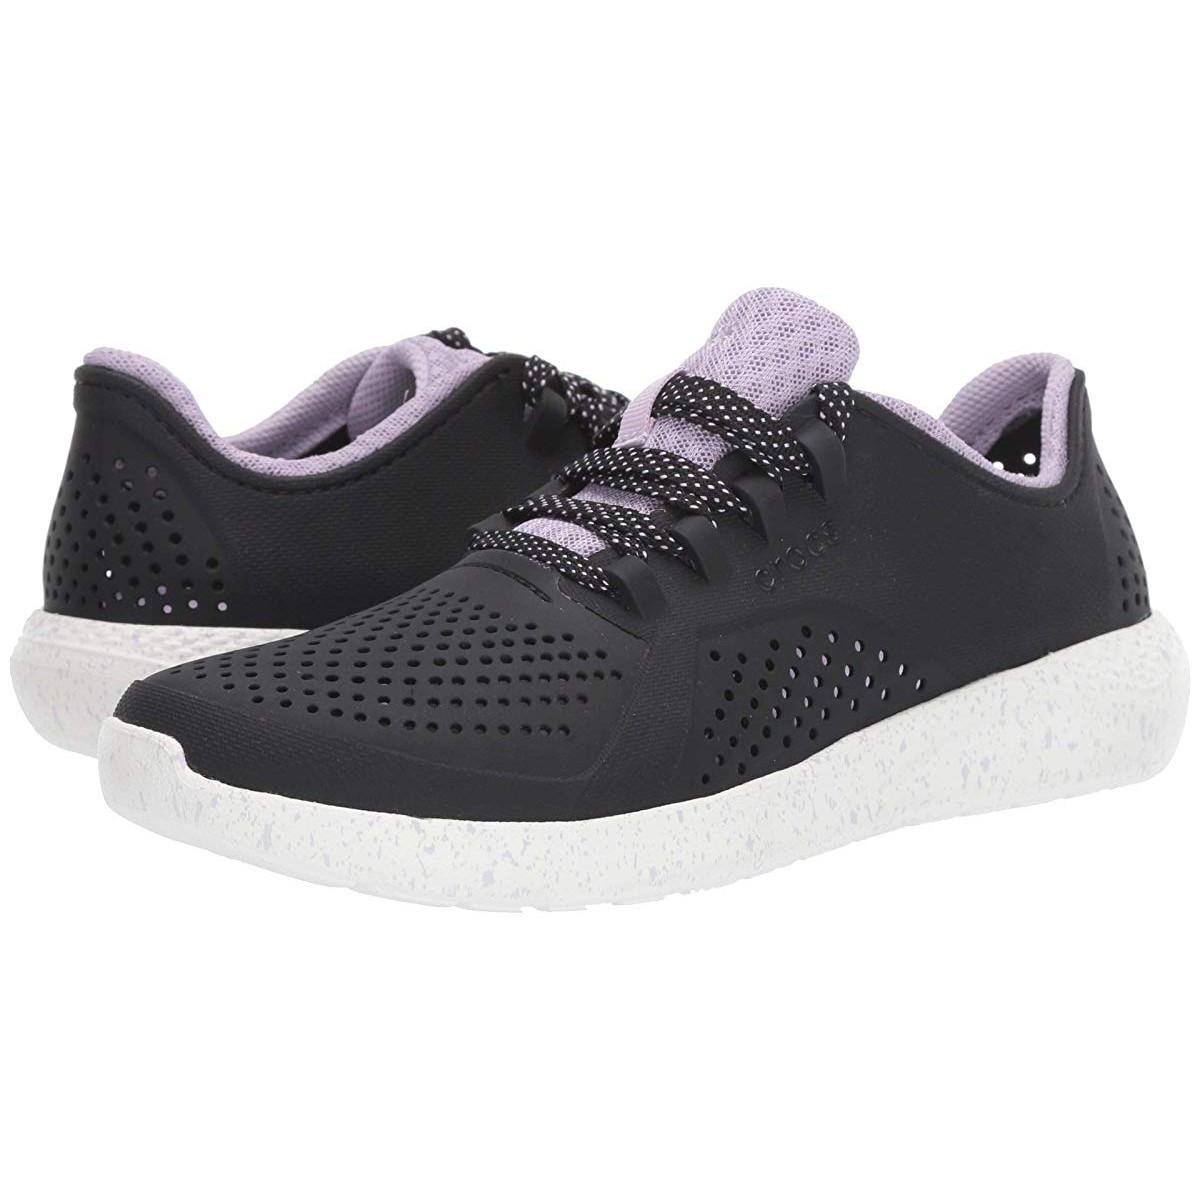 Кроссовки Crocs LiteRide Speckled Pacer Black/White - Оригинал, фото 1